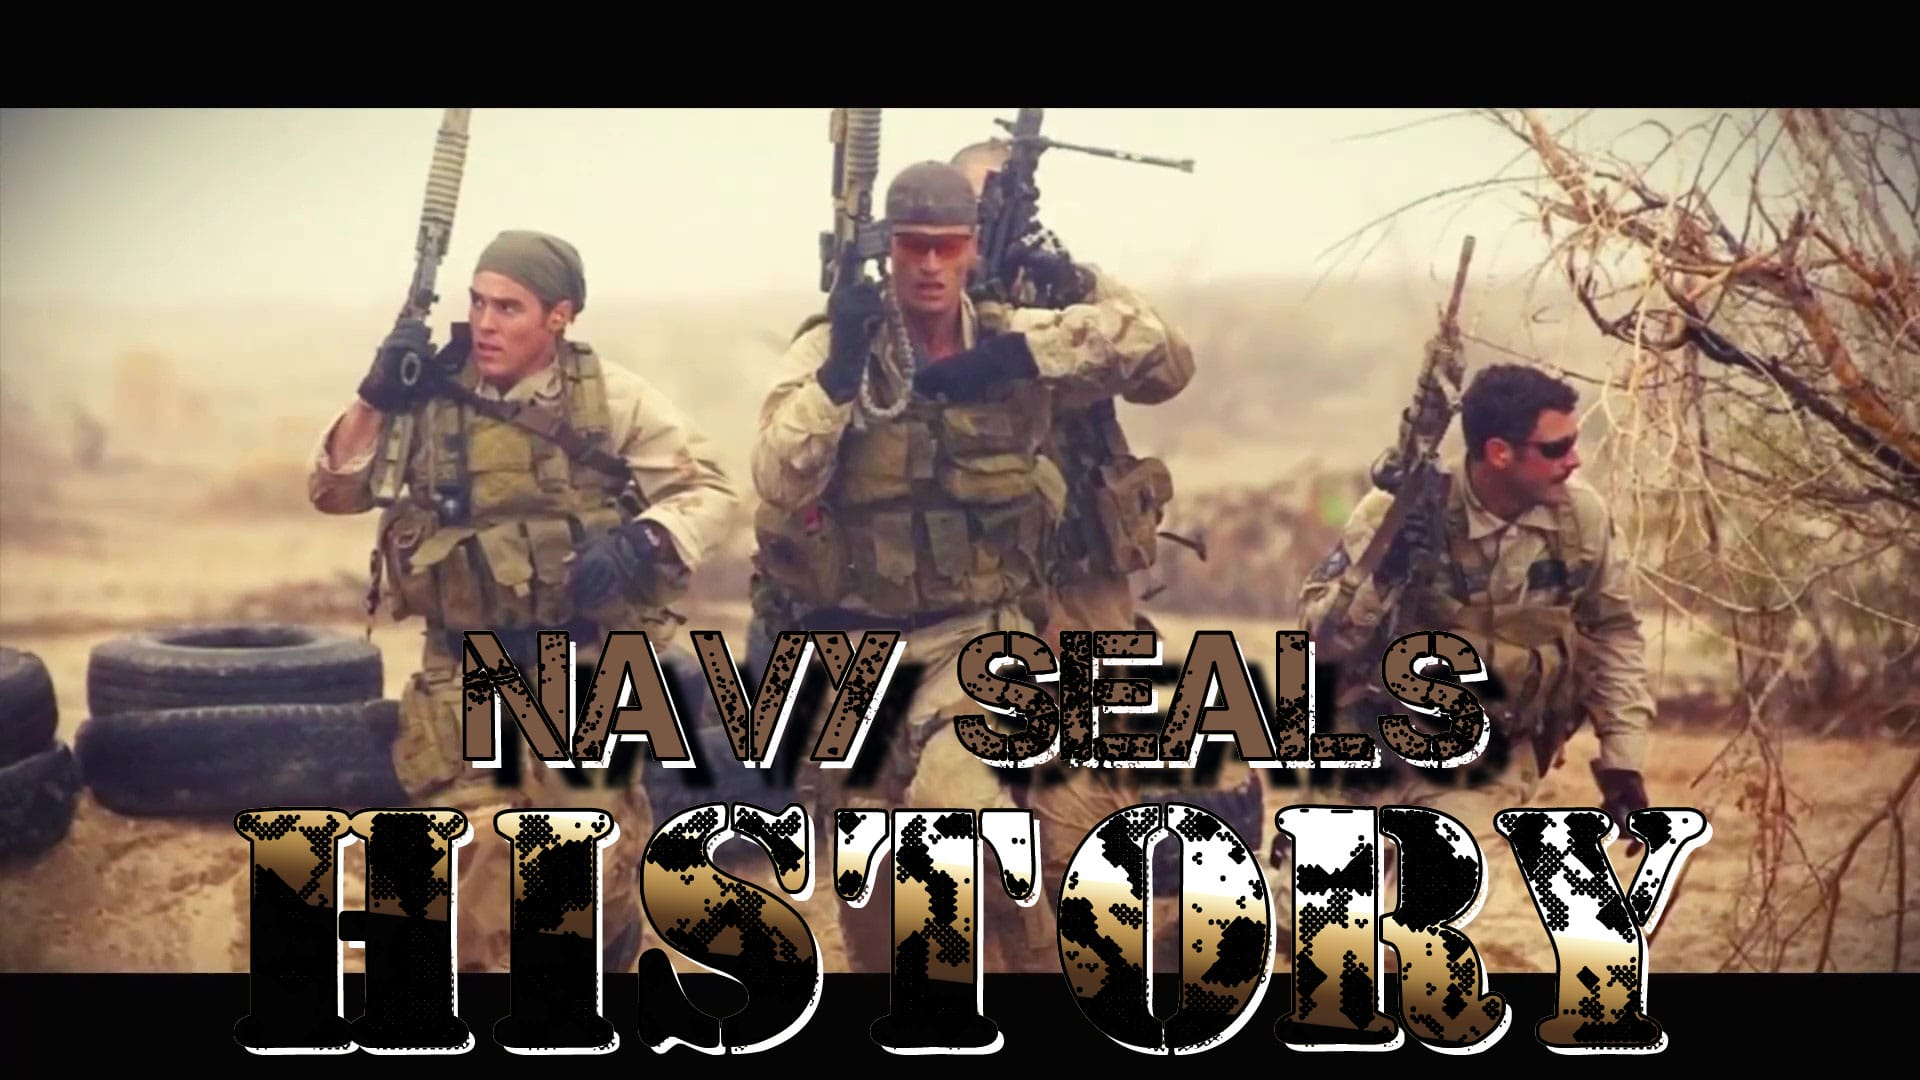 U.S. Navy SEALs History